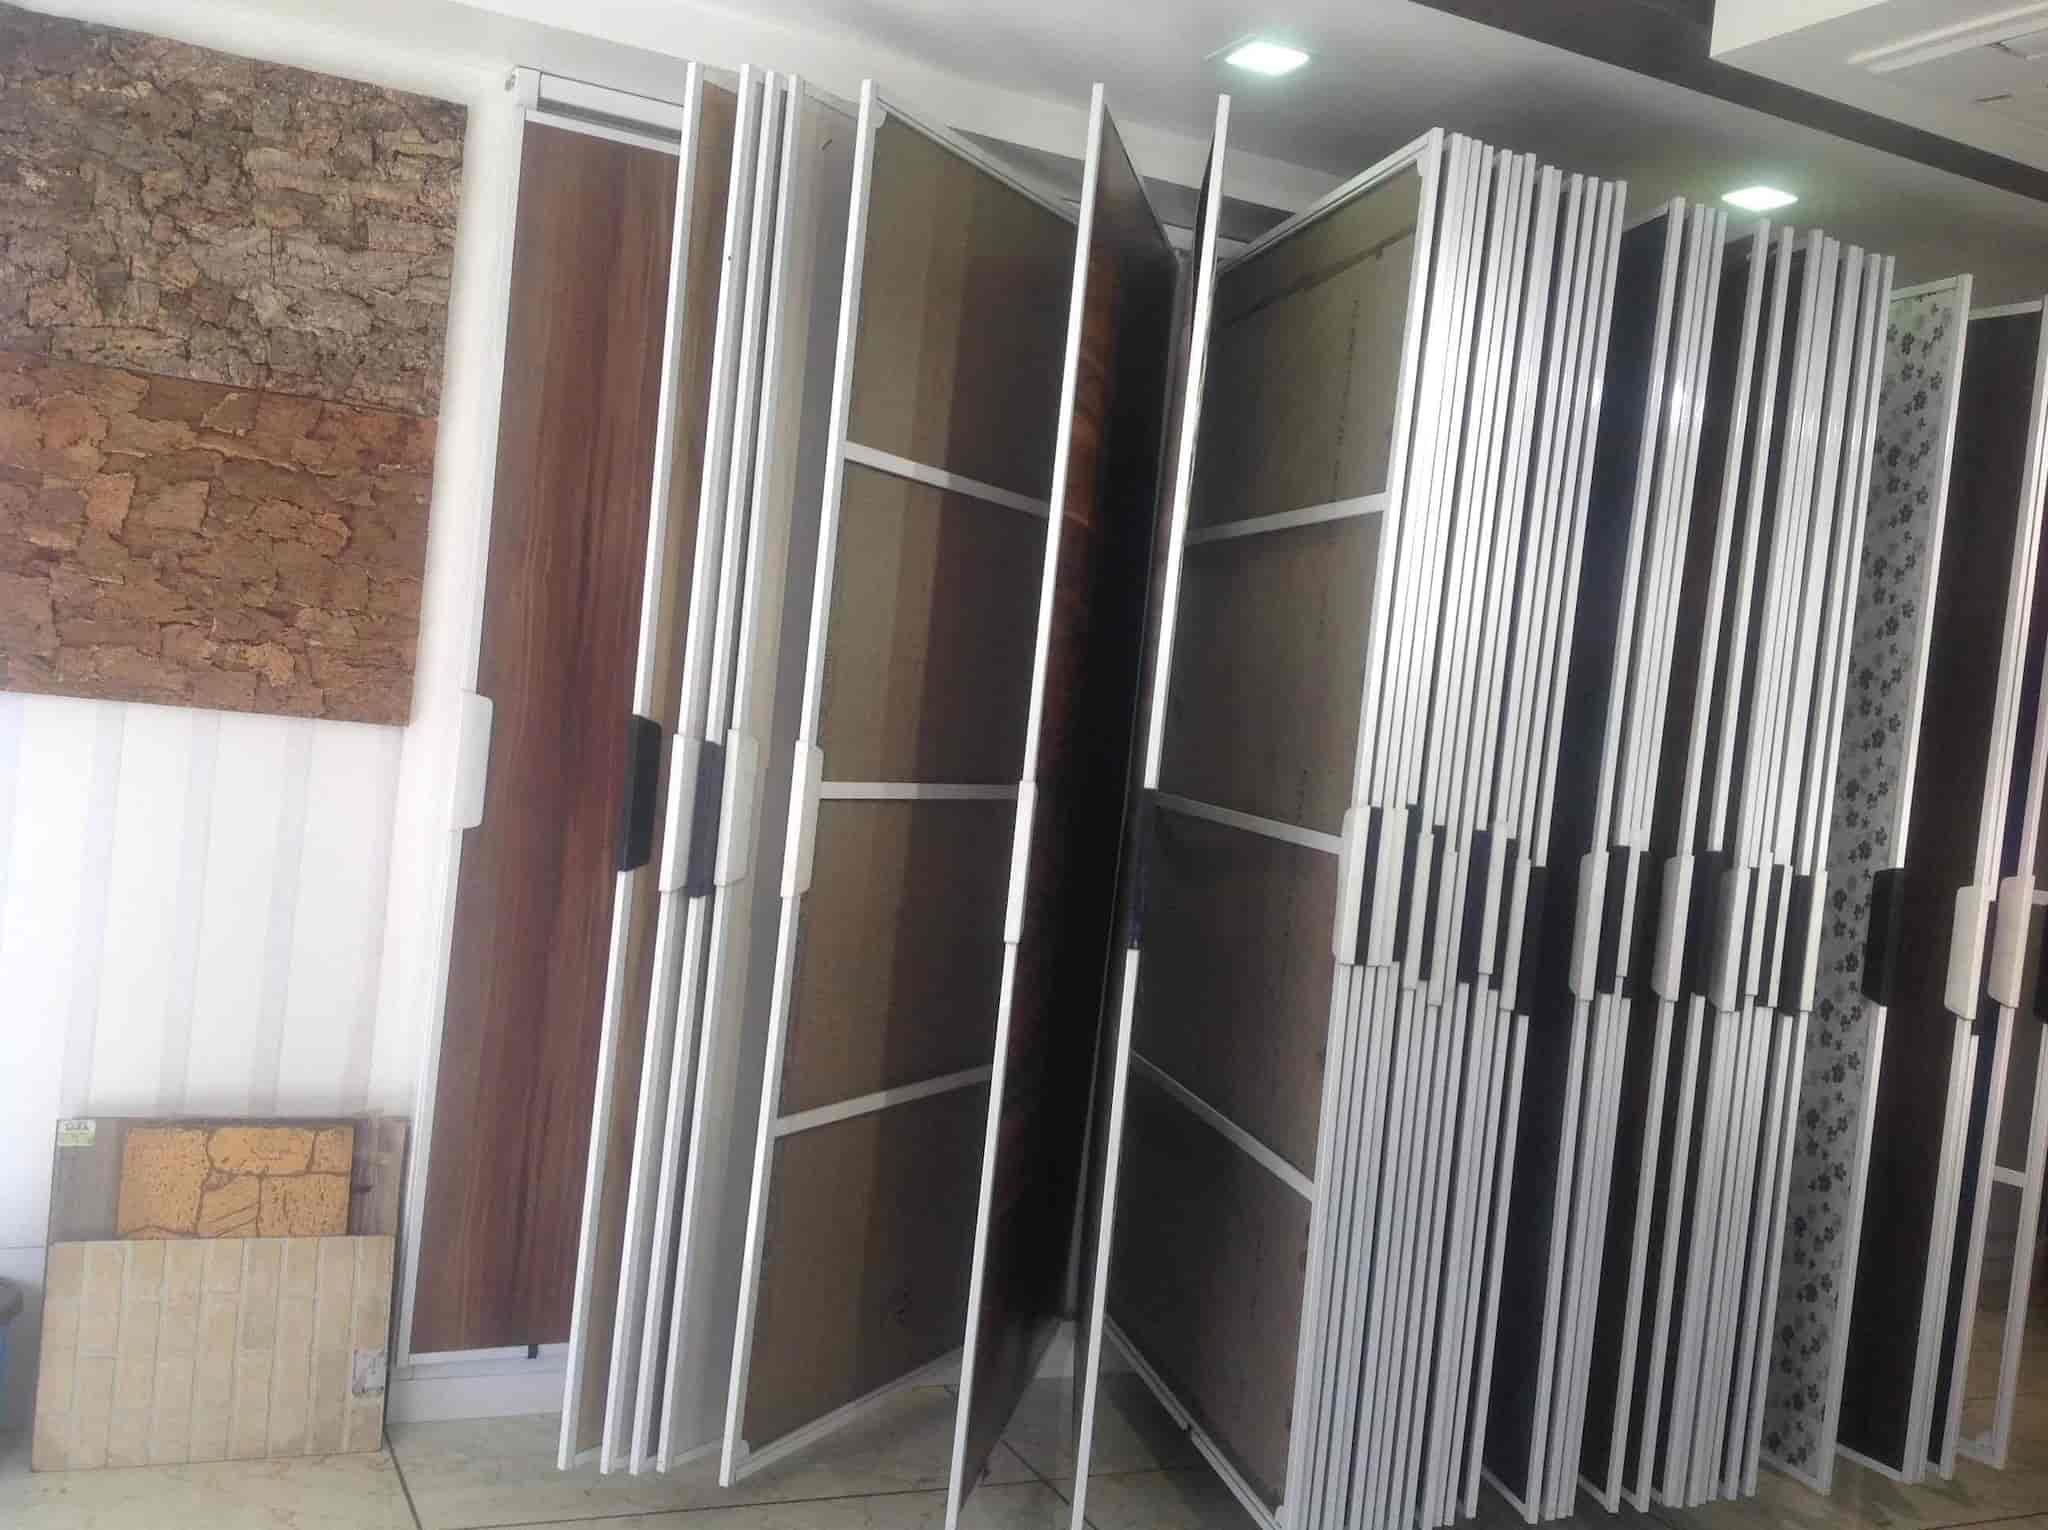 B Timber Industries Small Industrial Area - Plywood Dealers in Kota-Rajasthan - Justdial & B Timber Industries Small Industrial Area - Plywood Dealers in Kota ...